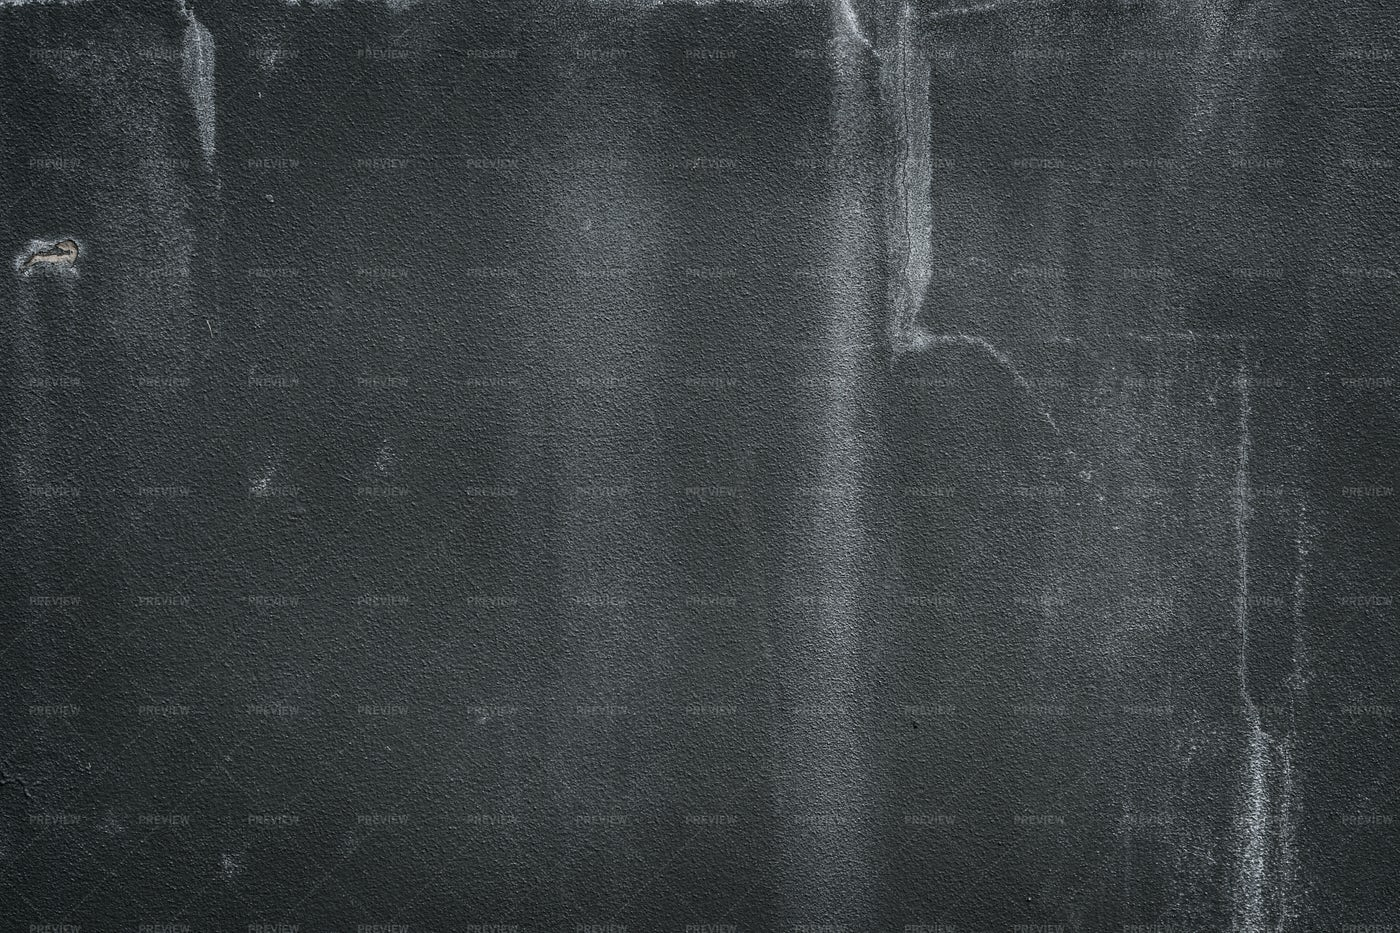 Streaky Concrete Wall: Stock Photos